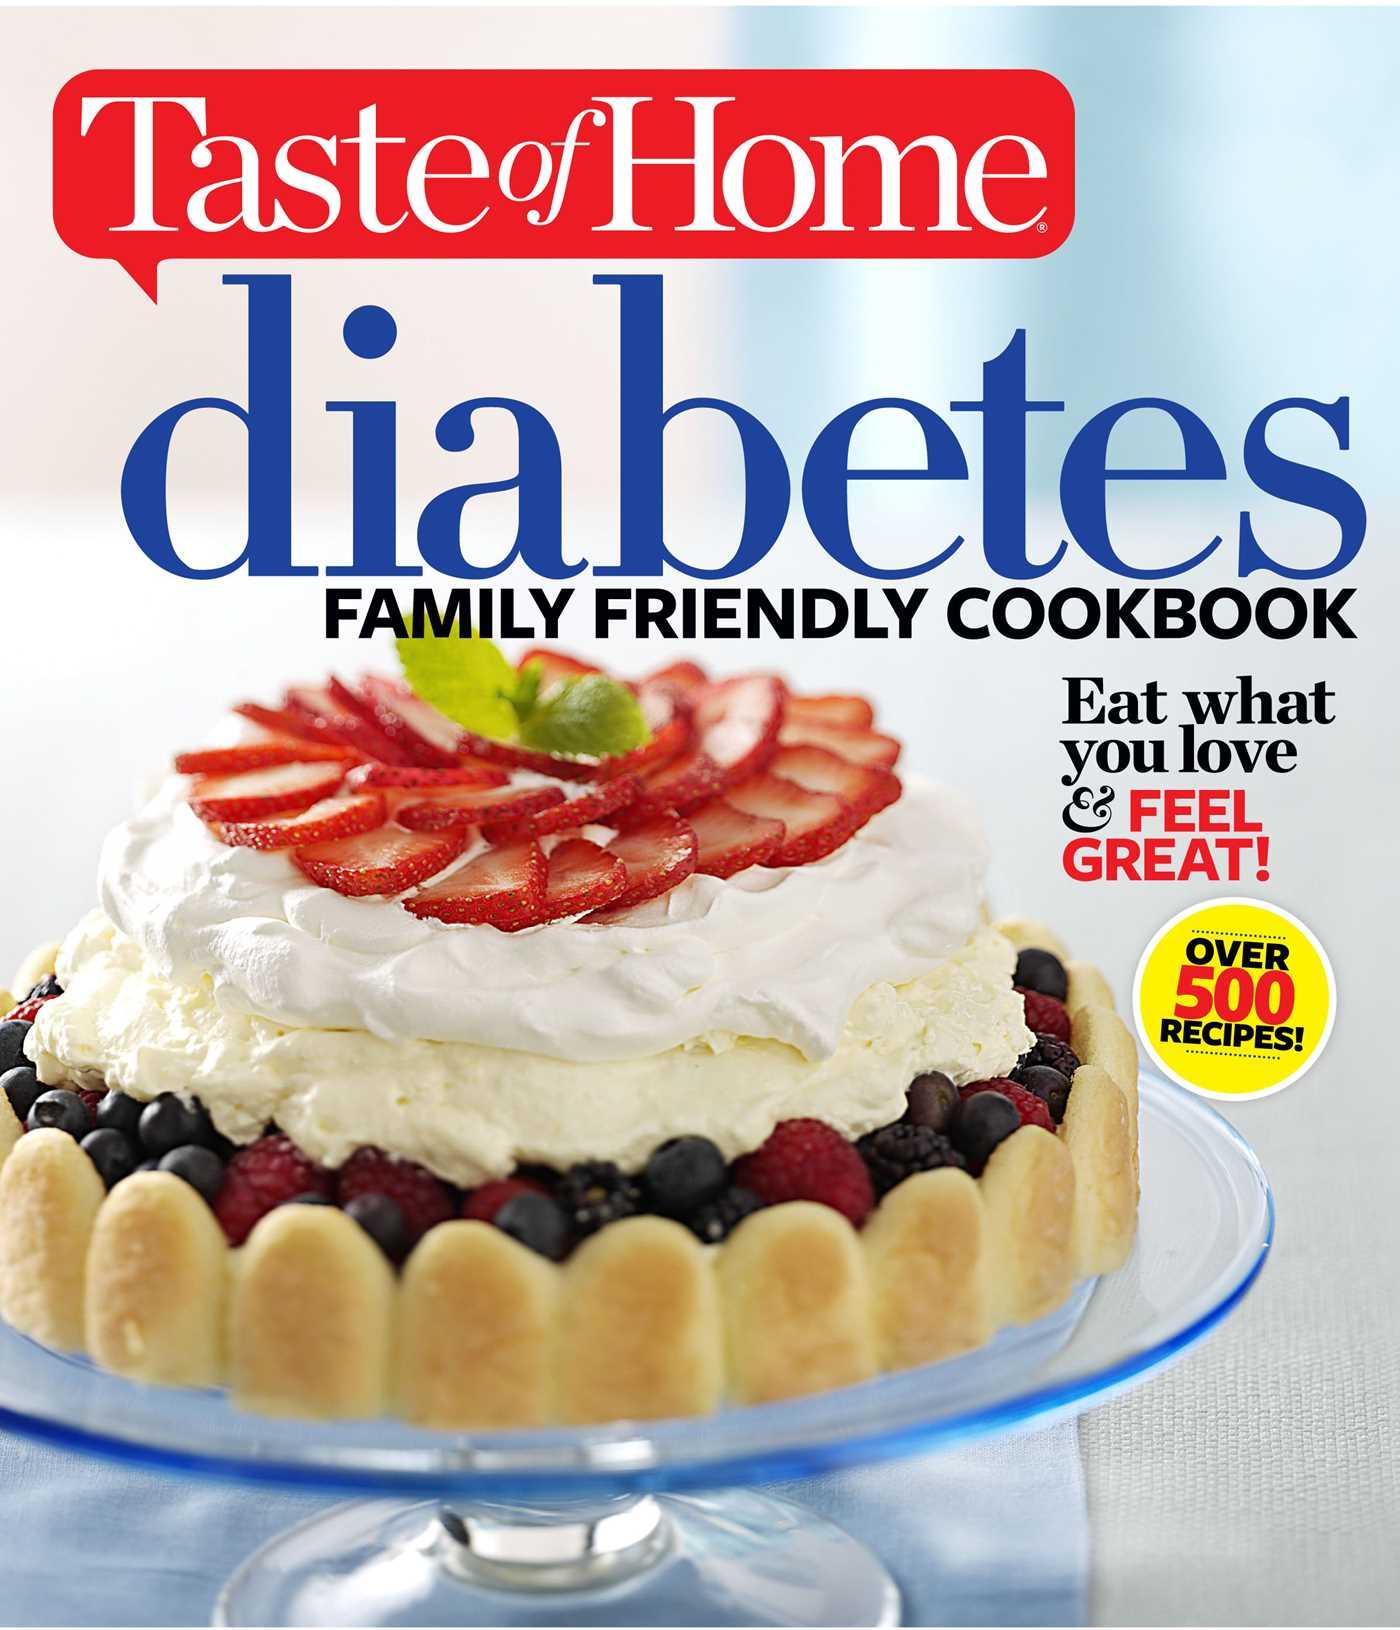 Taste of home diabetes family friendly cookbook 9781617652677 hr